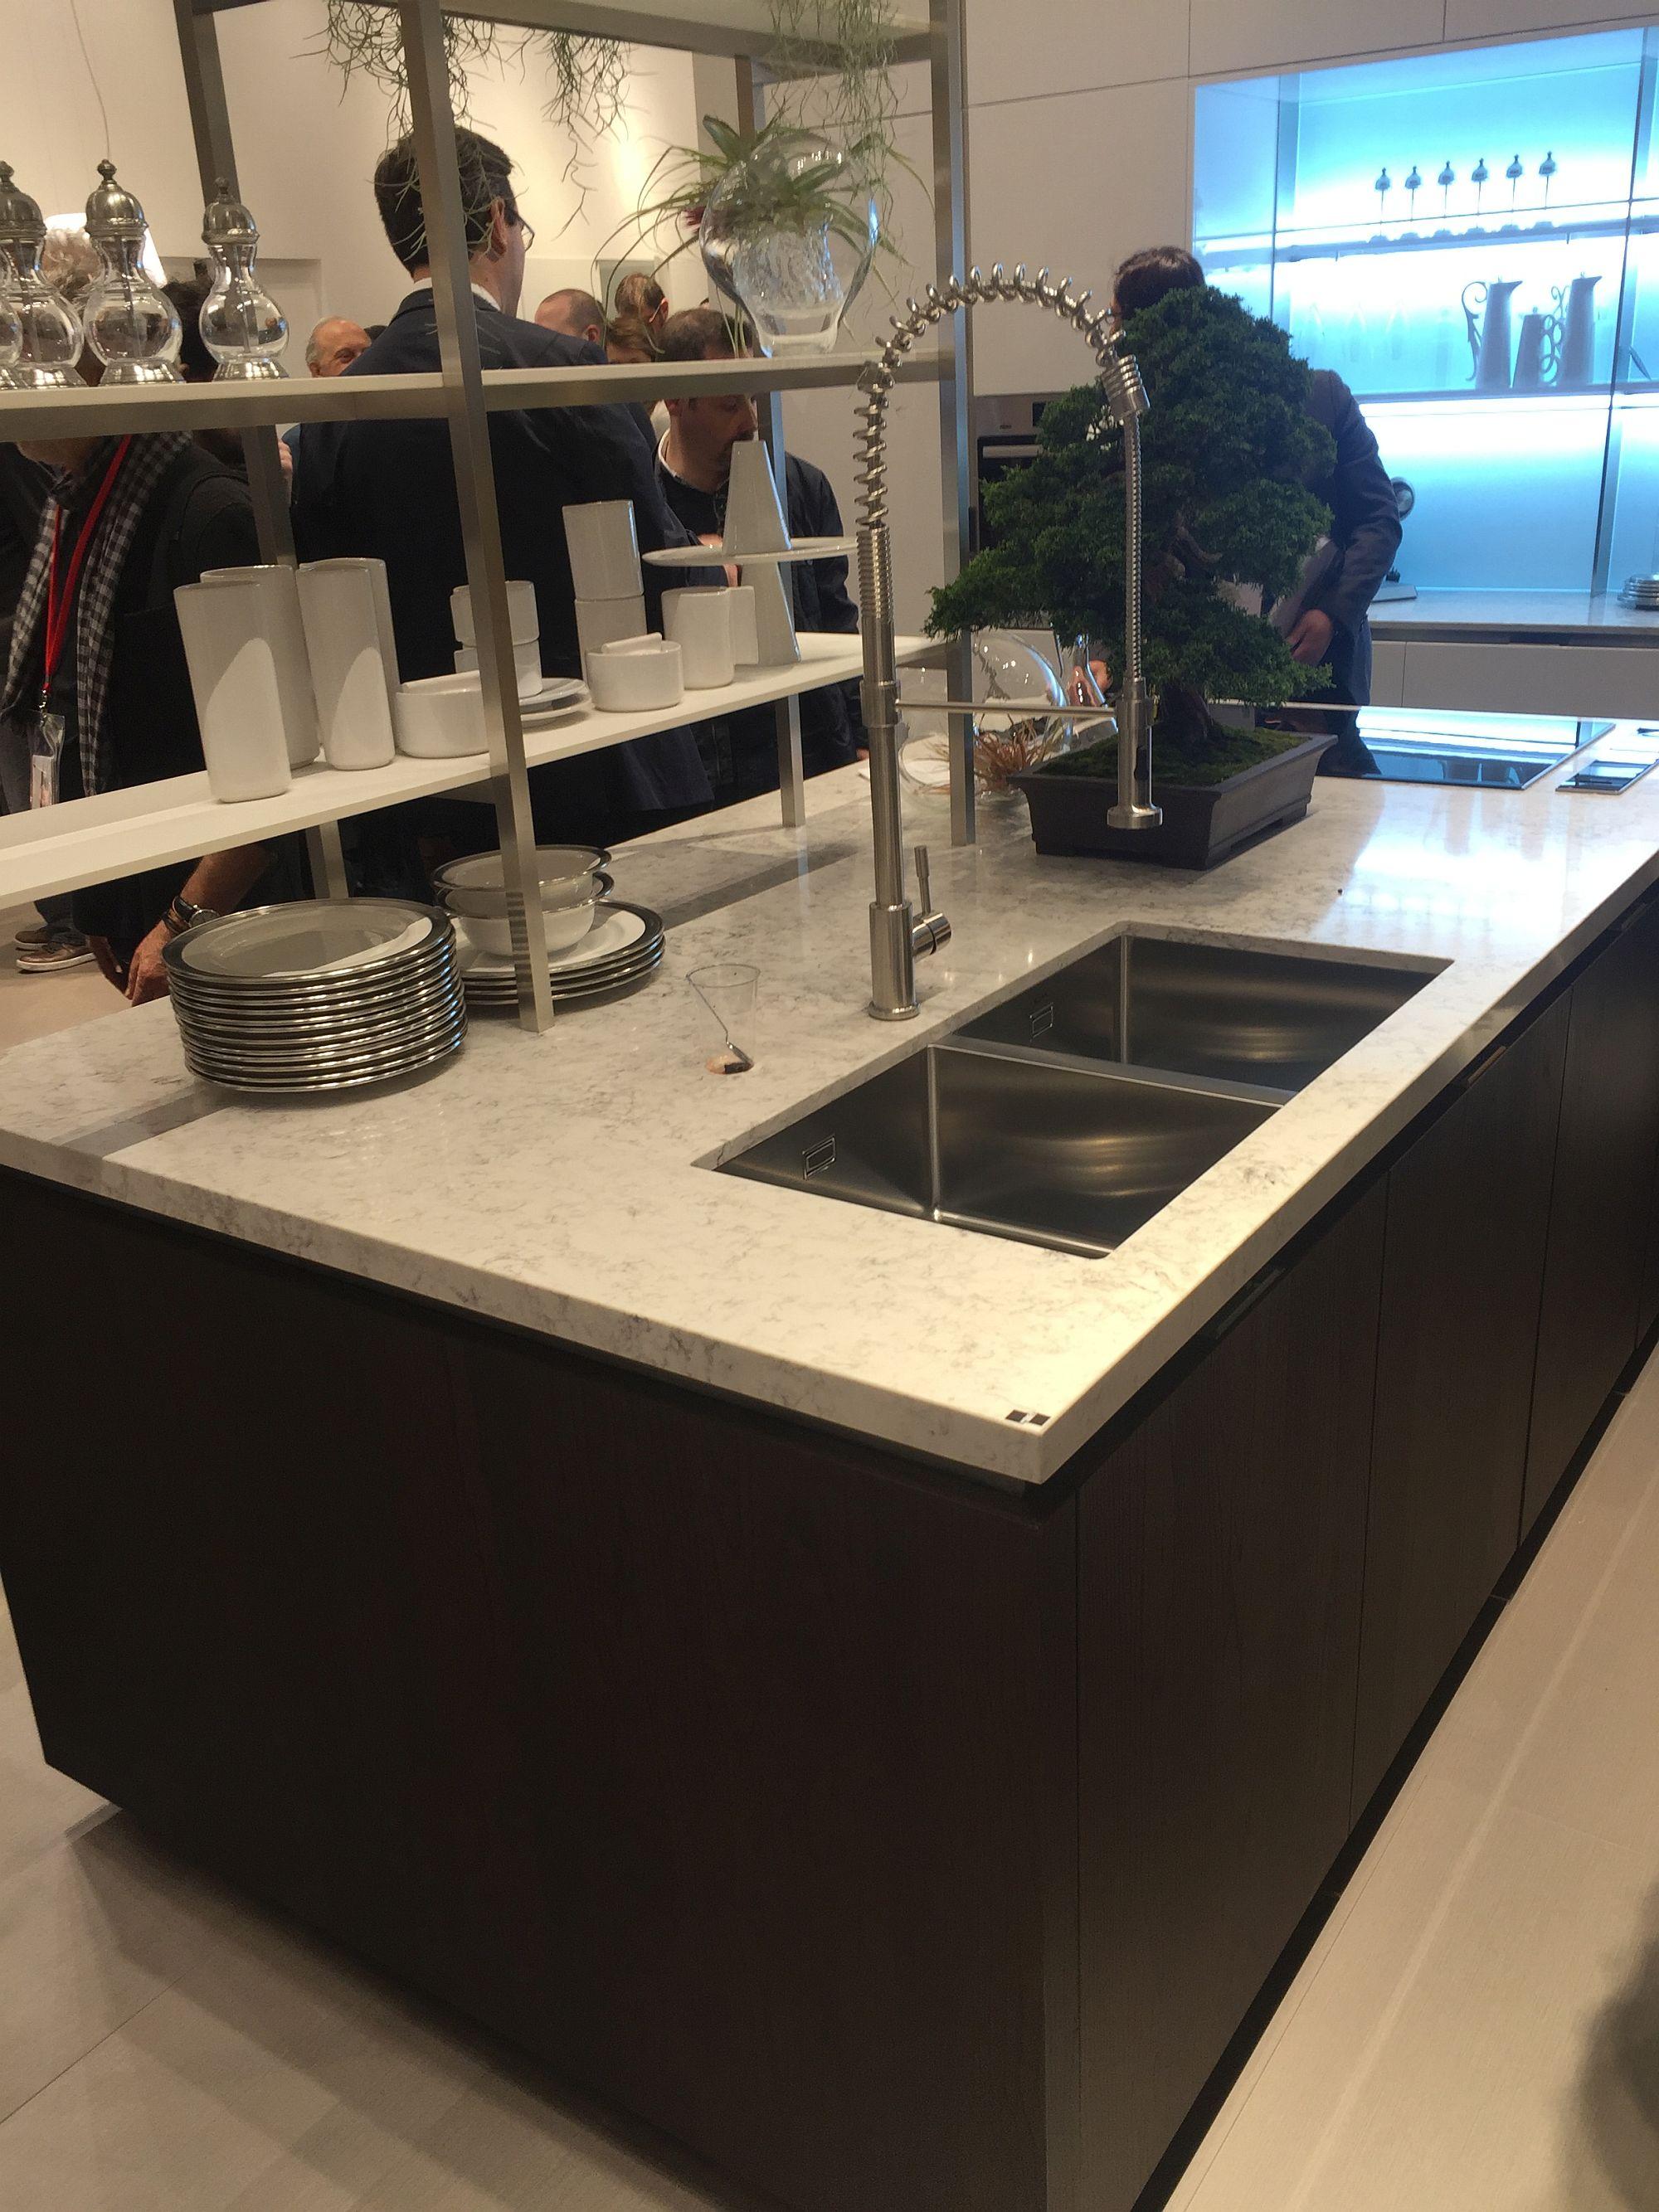 Dark kitchen cabinets bring contrast to the contemporary kitchen